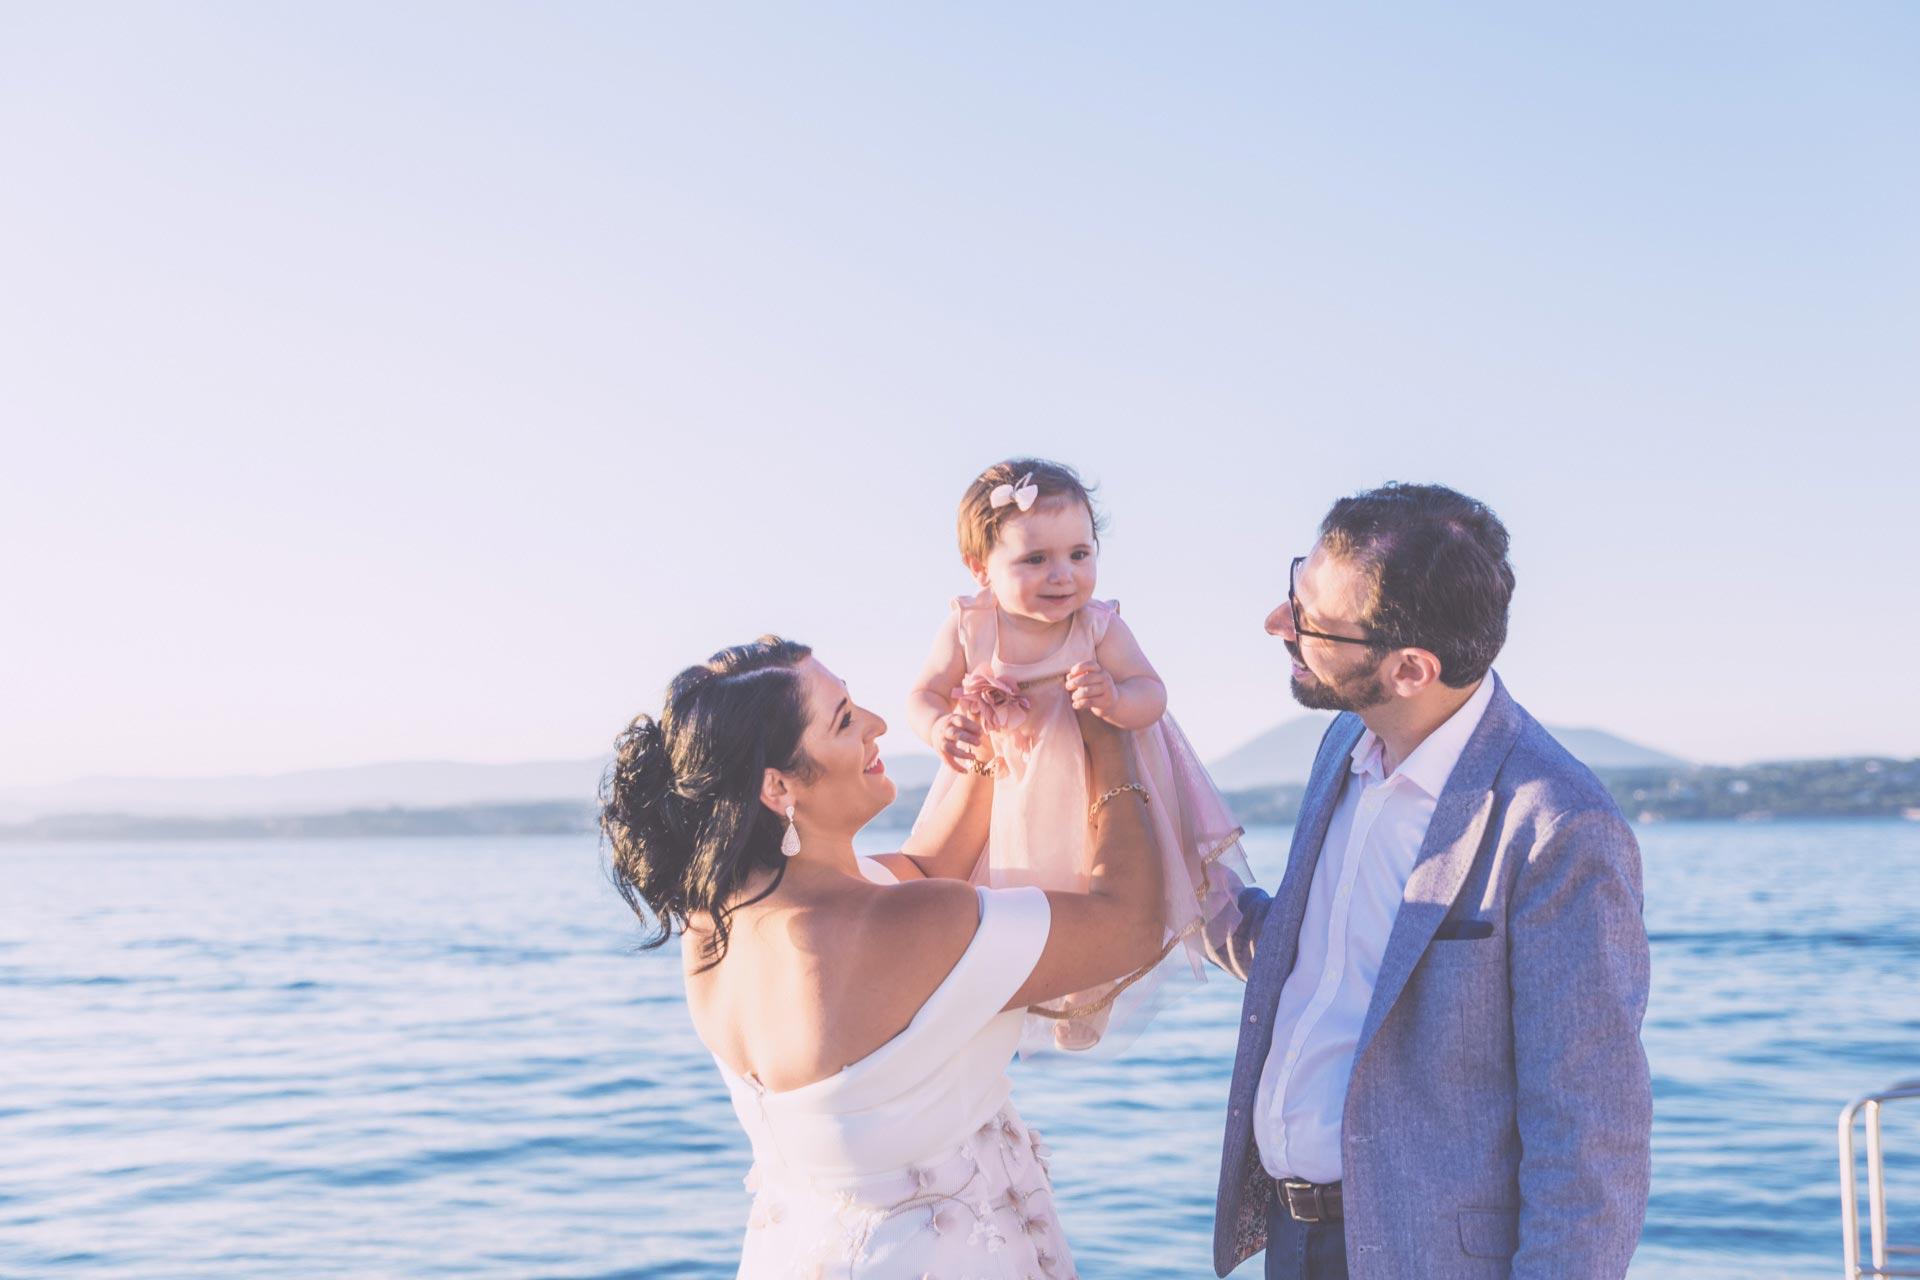 078 PhotoVaptisis Spetses vaptisi βαπτιση μωρο βαπτιστικά βαπριση σπετσες αγιος μαμας διακοσμηση βάπτισης γονείς νονά